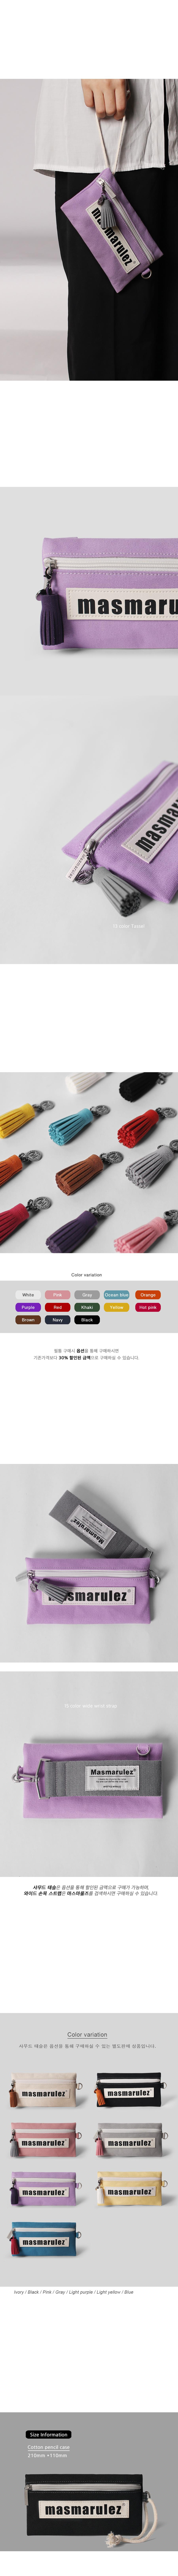 purple-d4.jpg